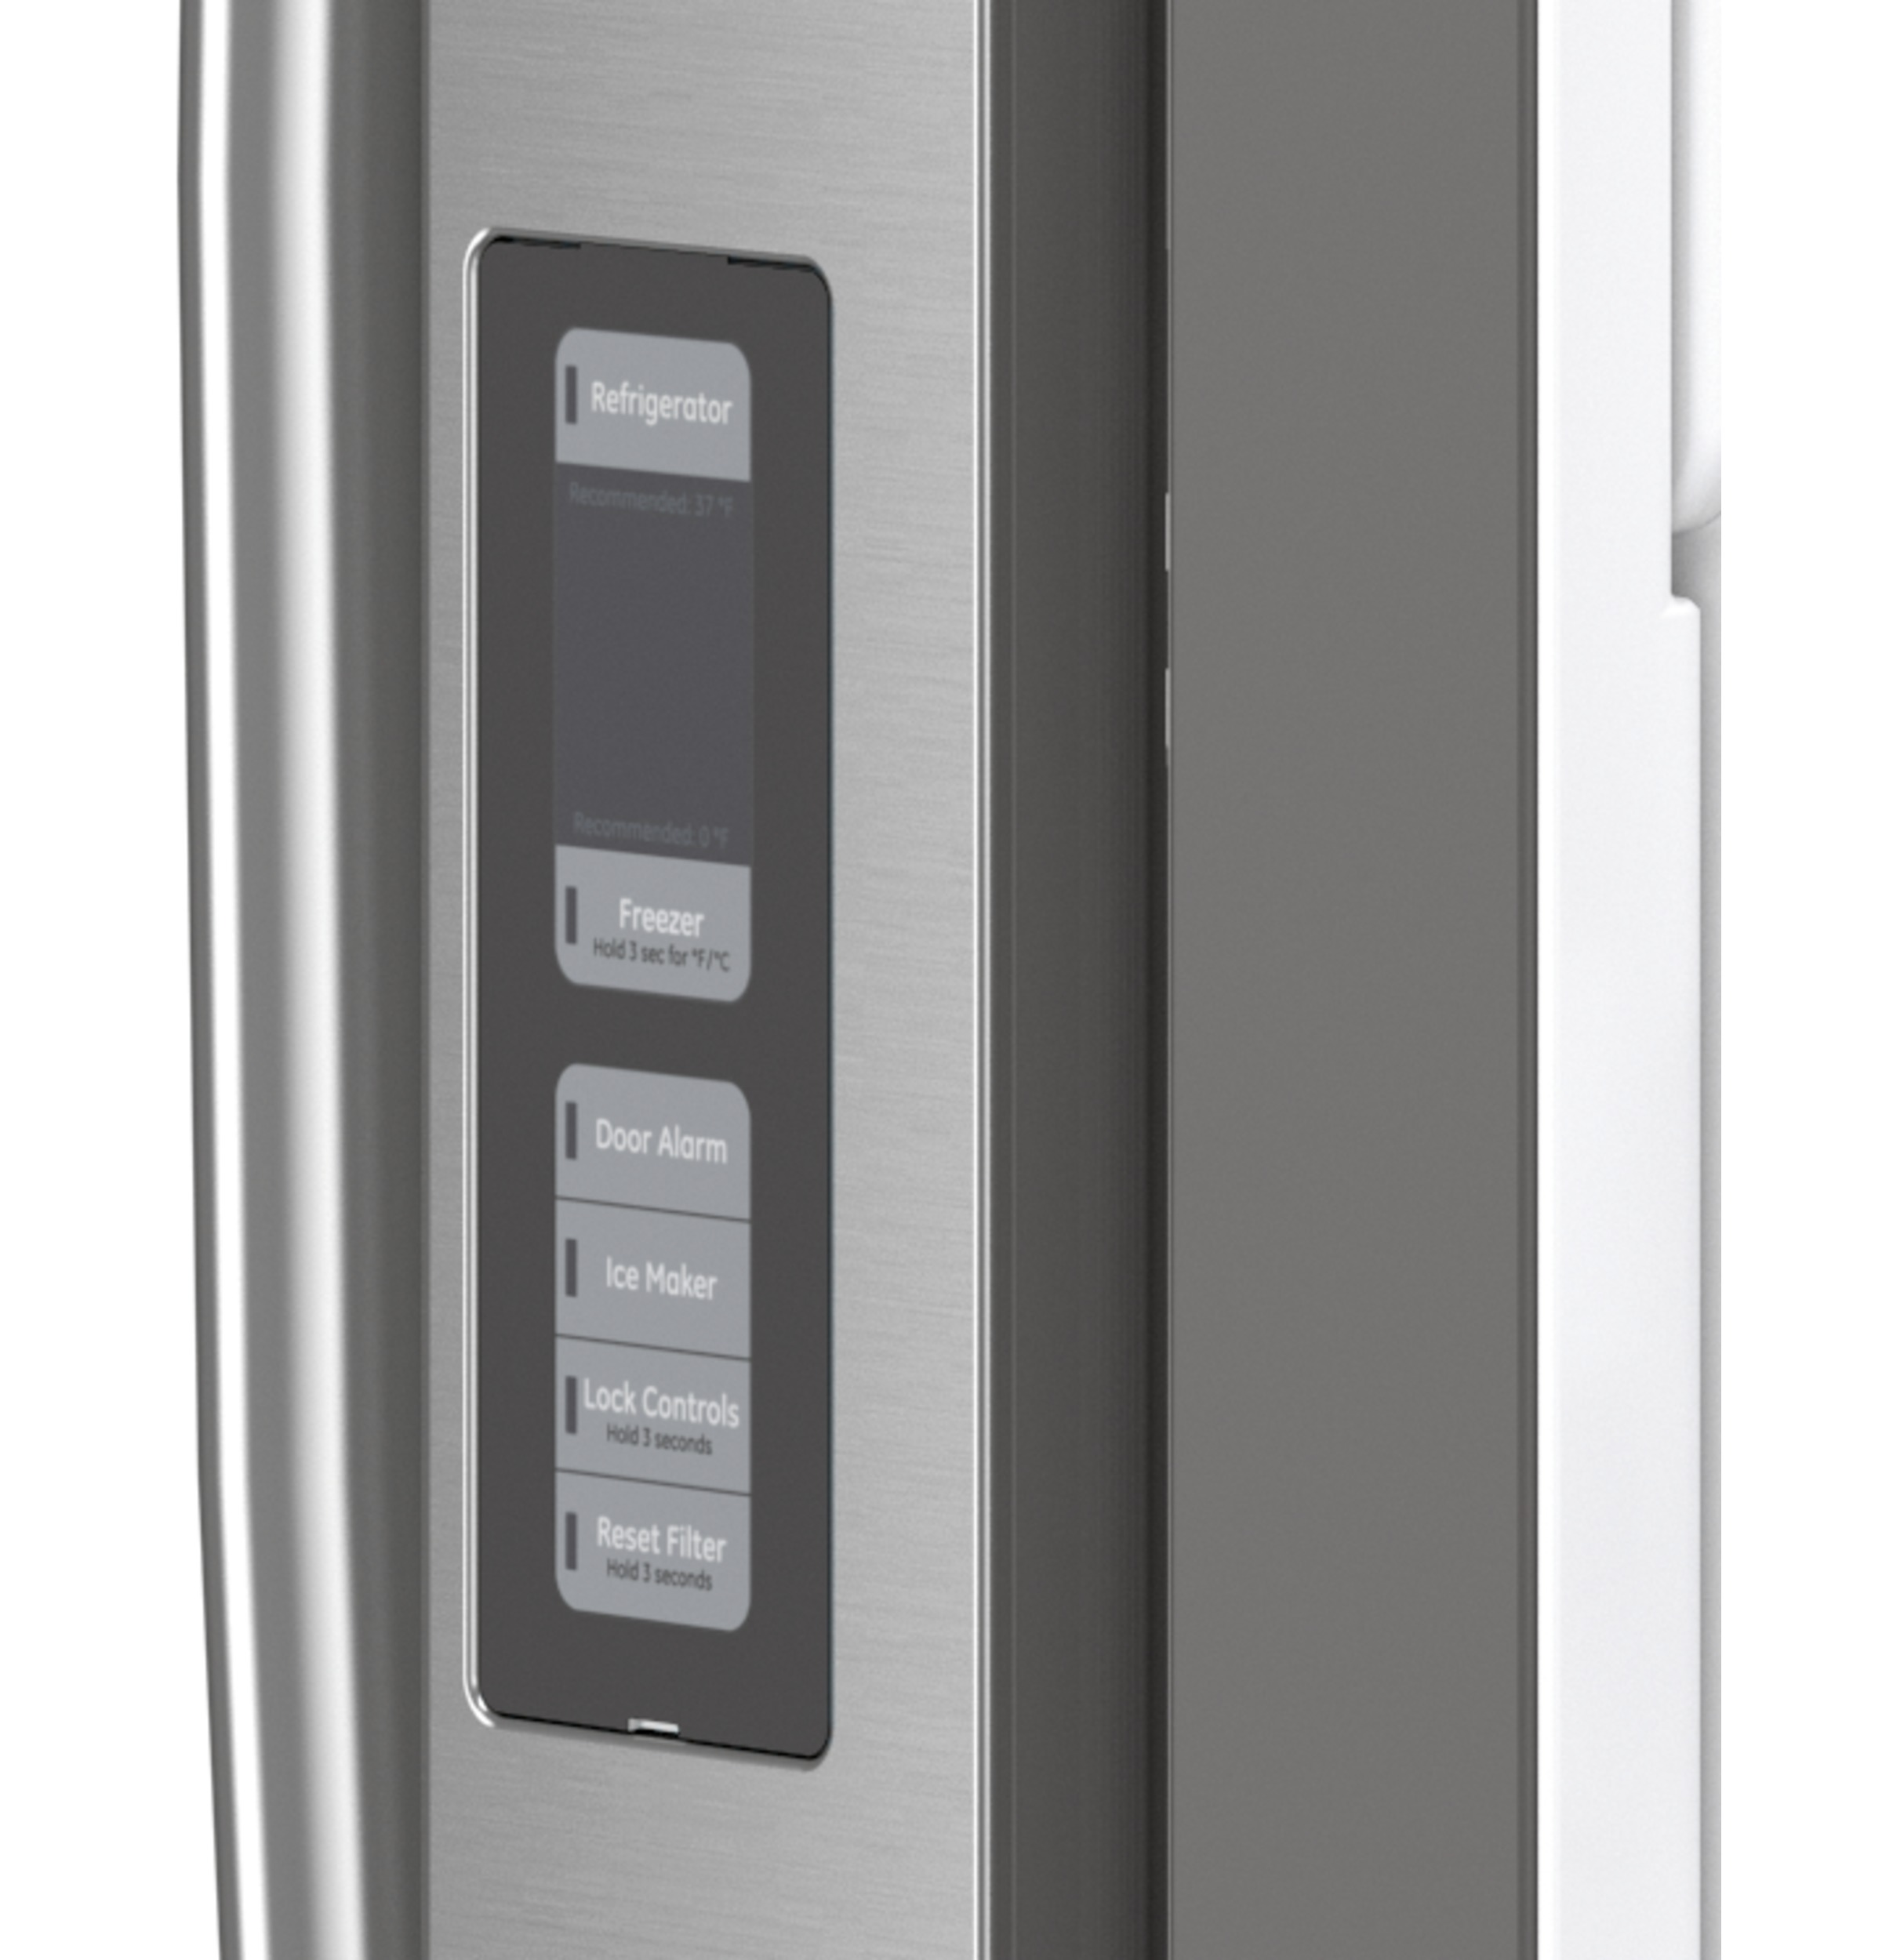 Model: GWE23GYNFS | GE GE® ENERGY STAR® 23.1 Cu. Ft. Counter-Depth Fingerprint Resistant French-Door Refrigerator